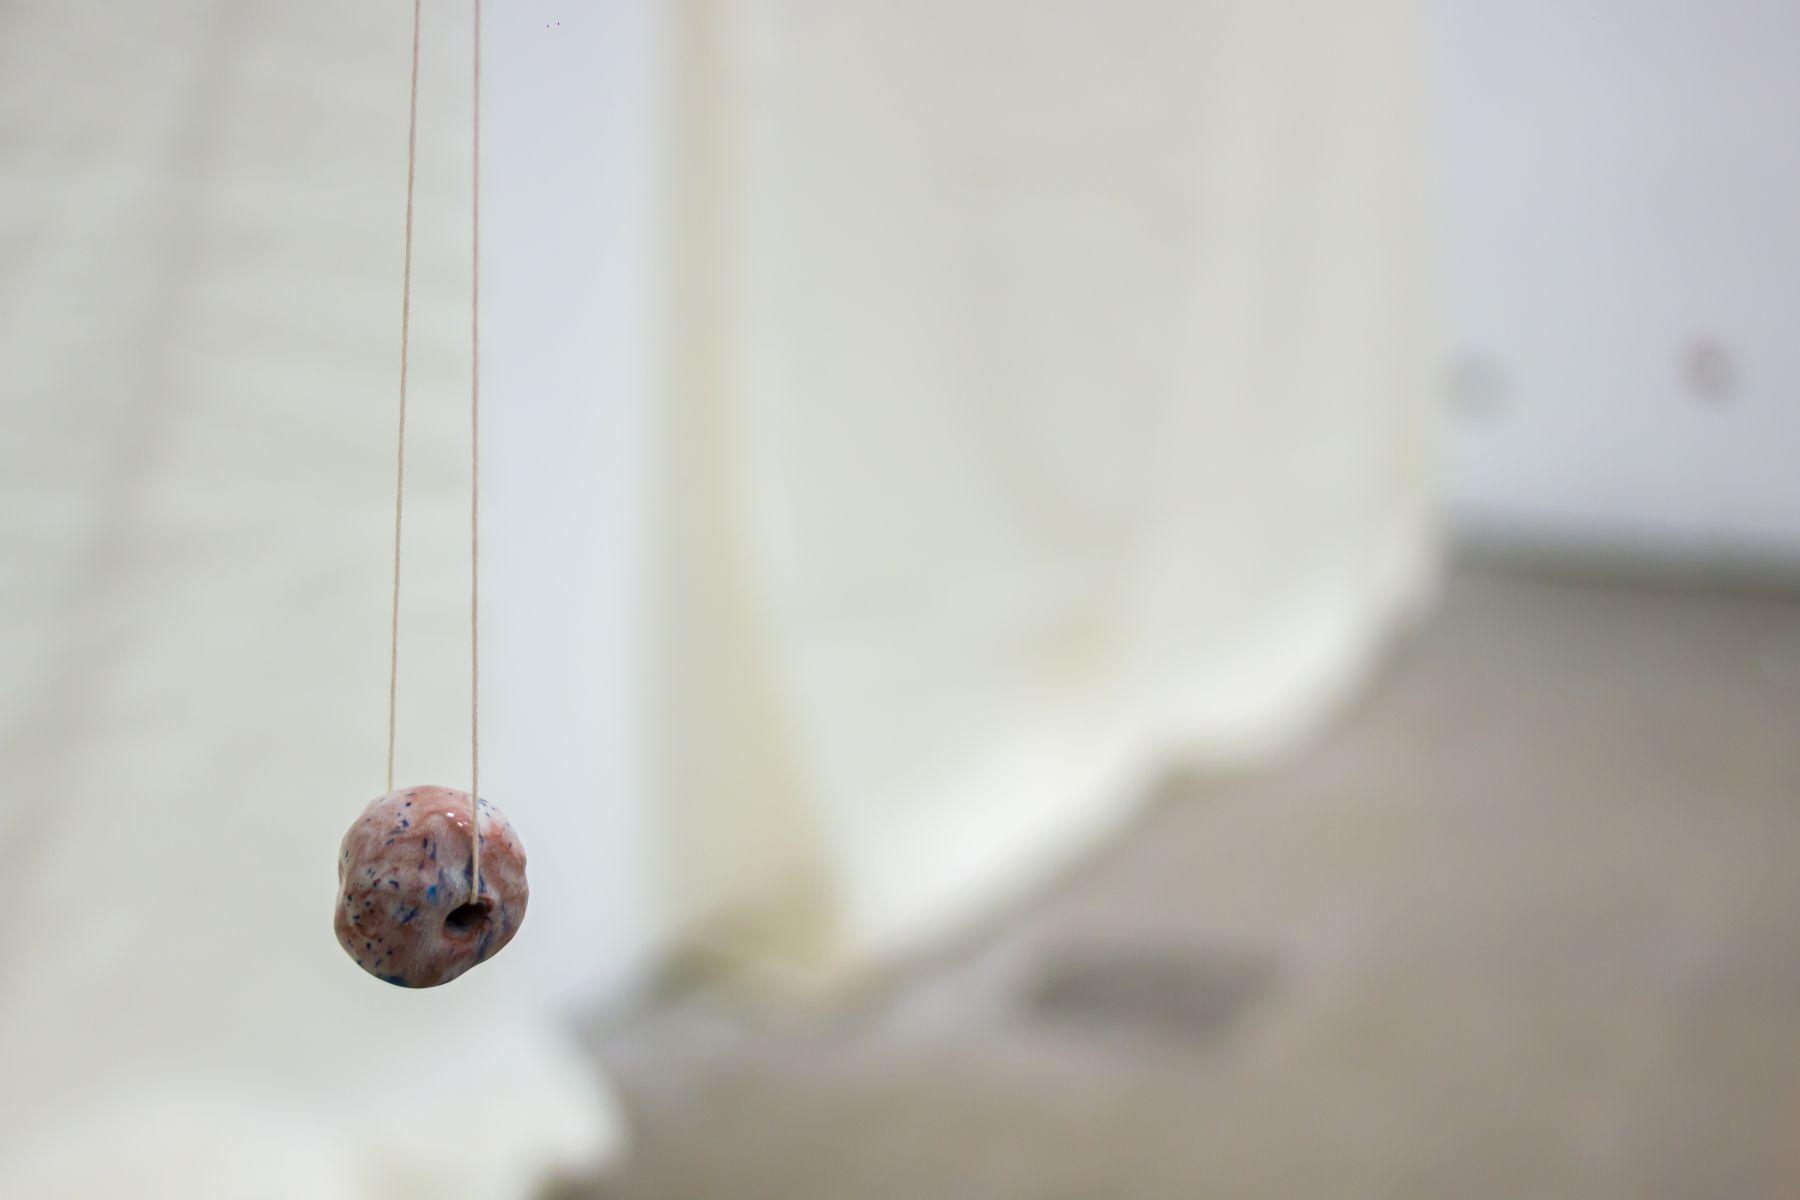 Polly Apfelbaum, Shades of White, detail,2019, installation view, Ikon Gallery, Birmingham, United Kingdom(2019)